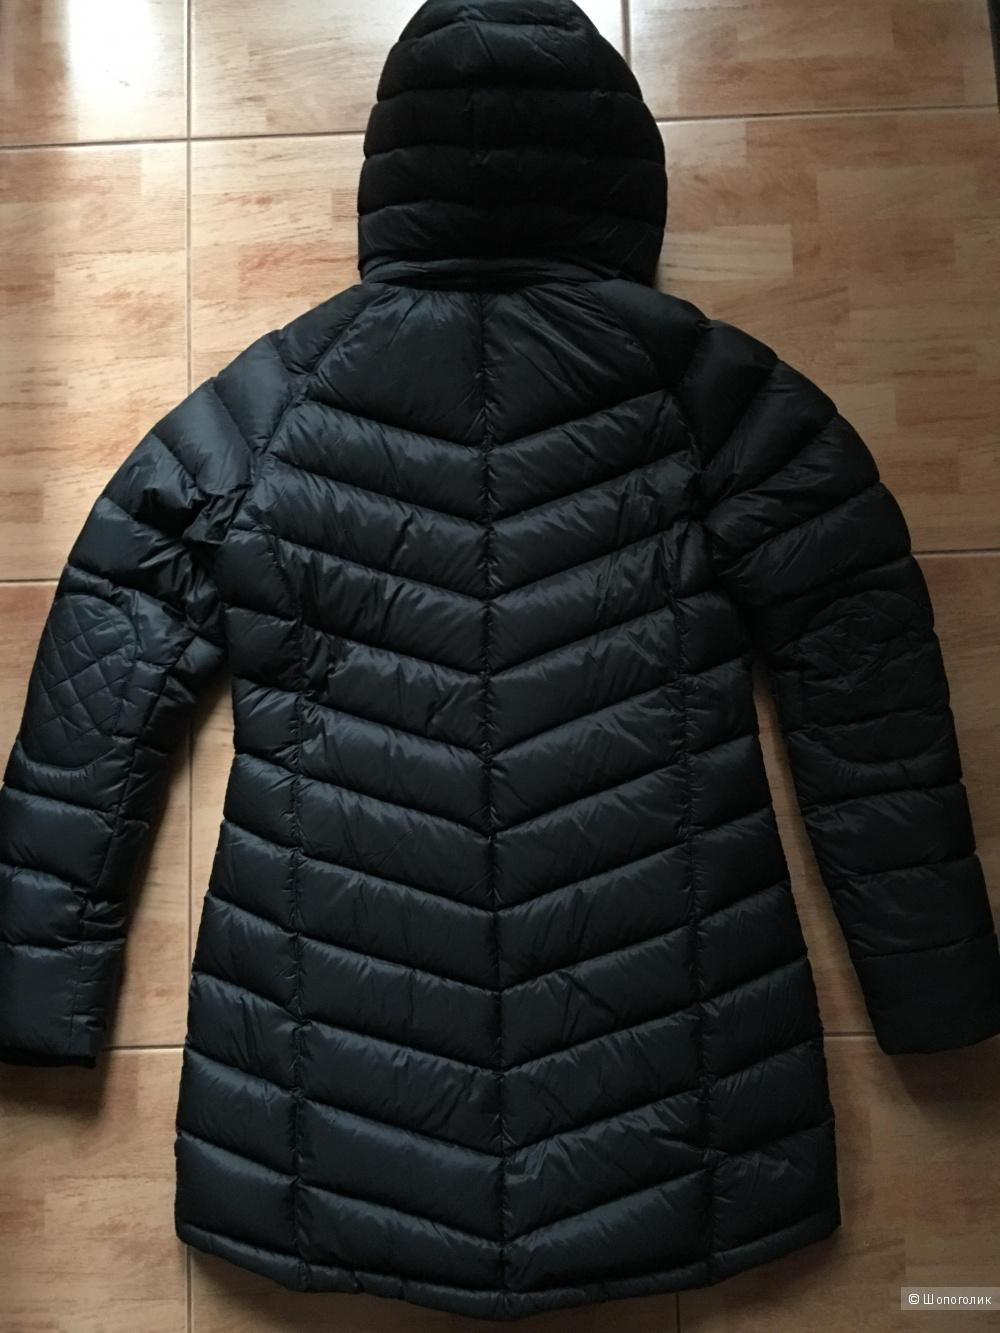 Пуховик Pajar Callie Long Jacket, размер L